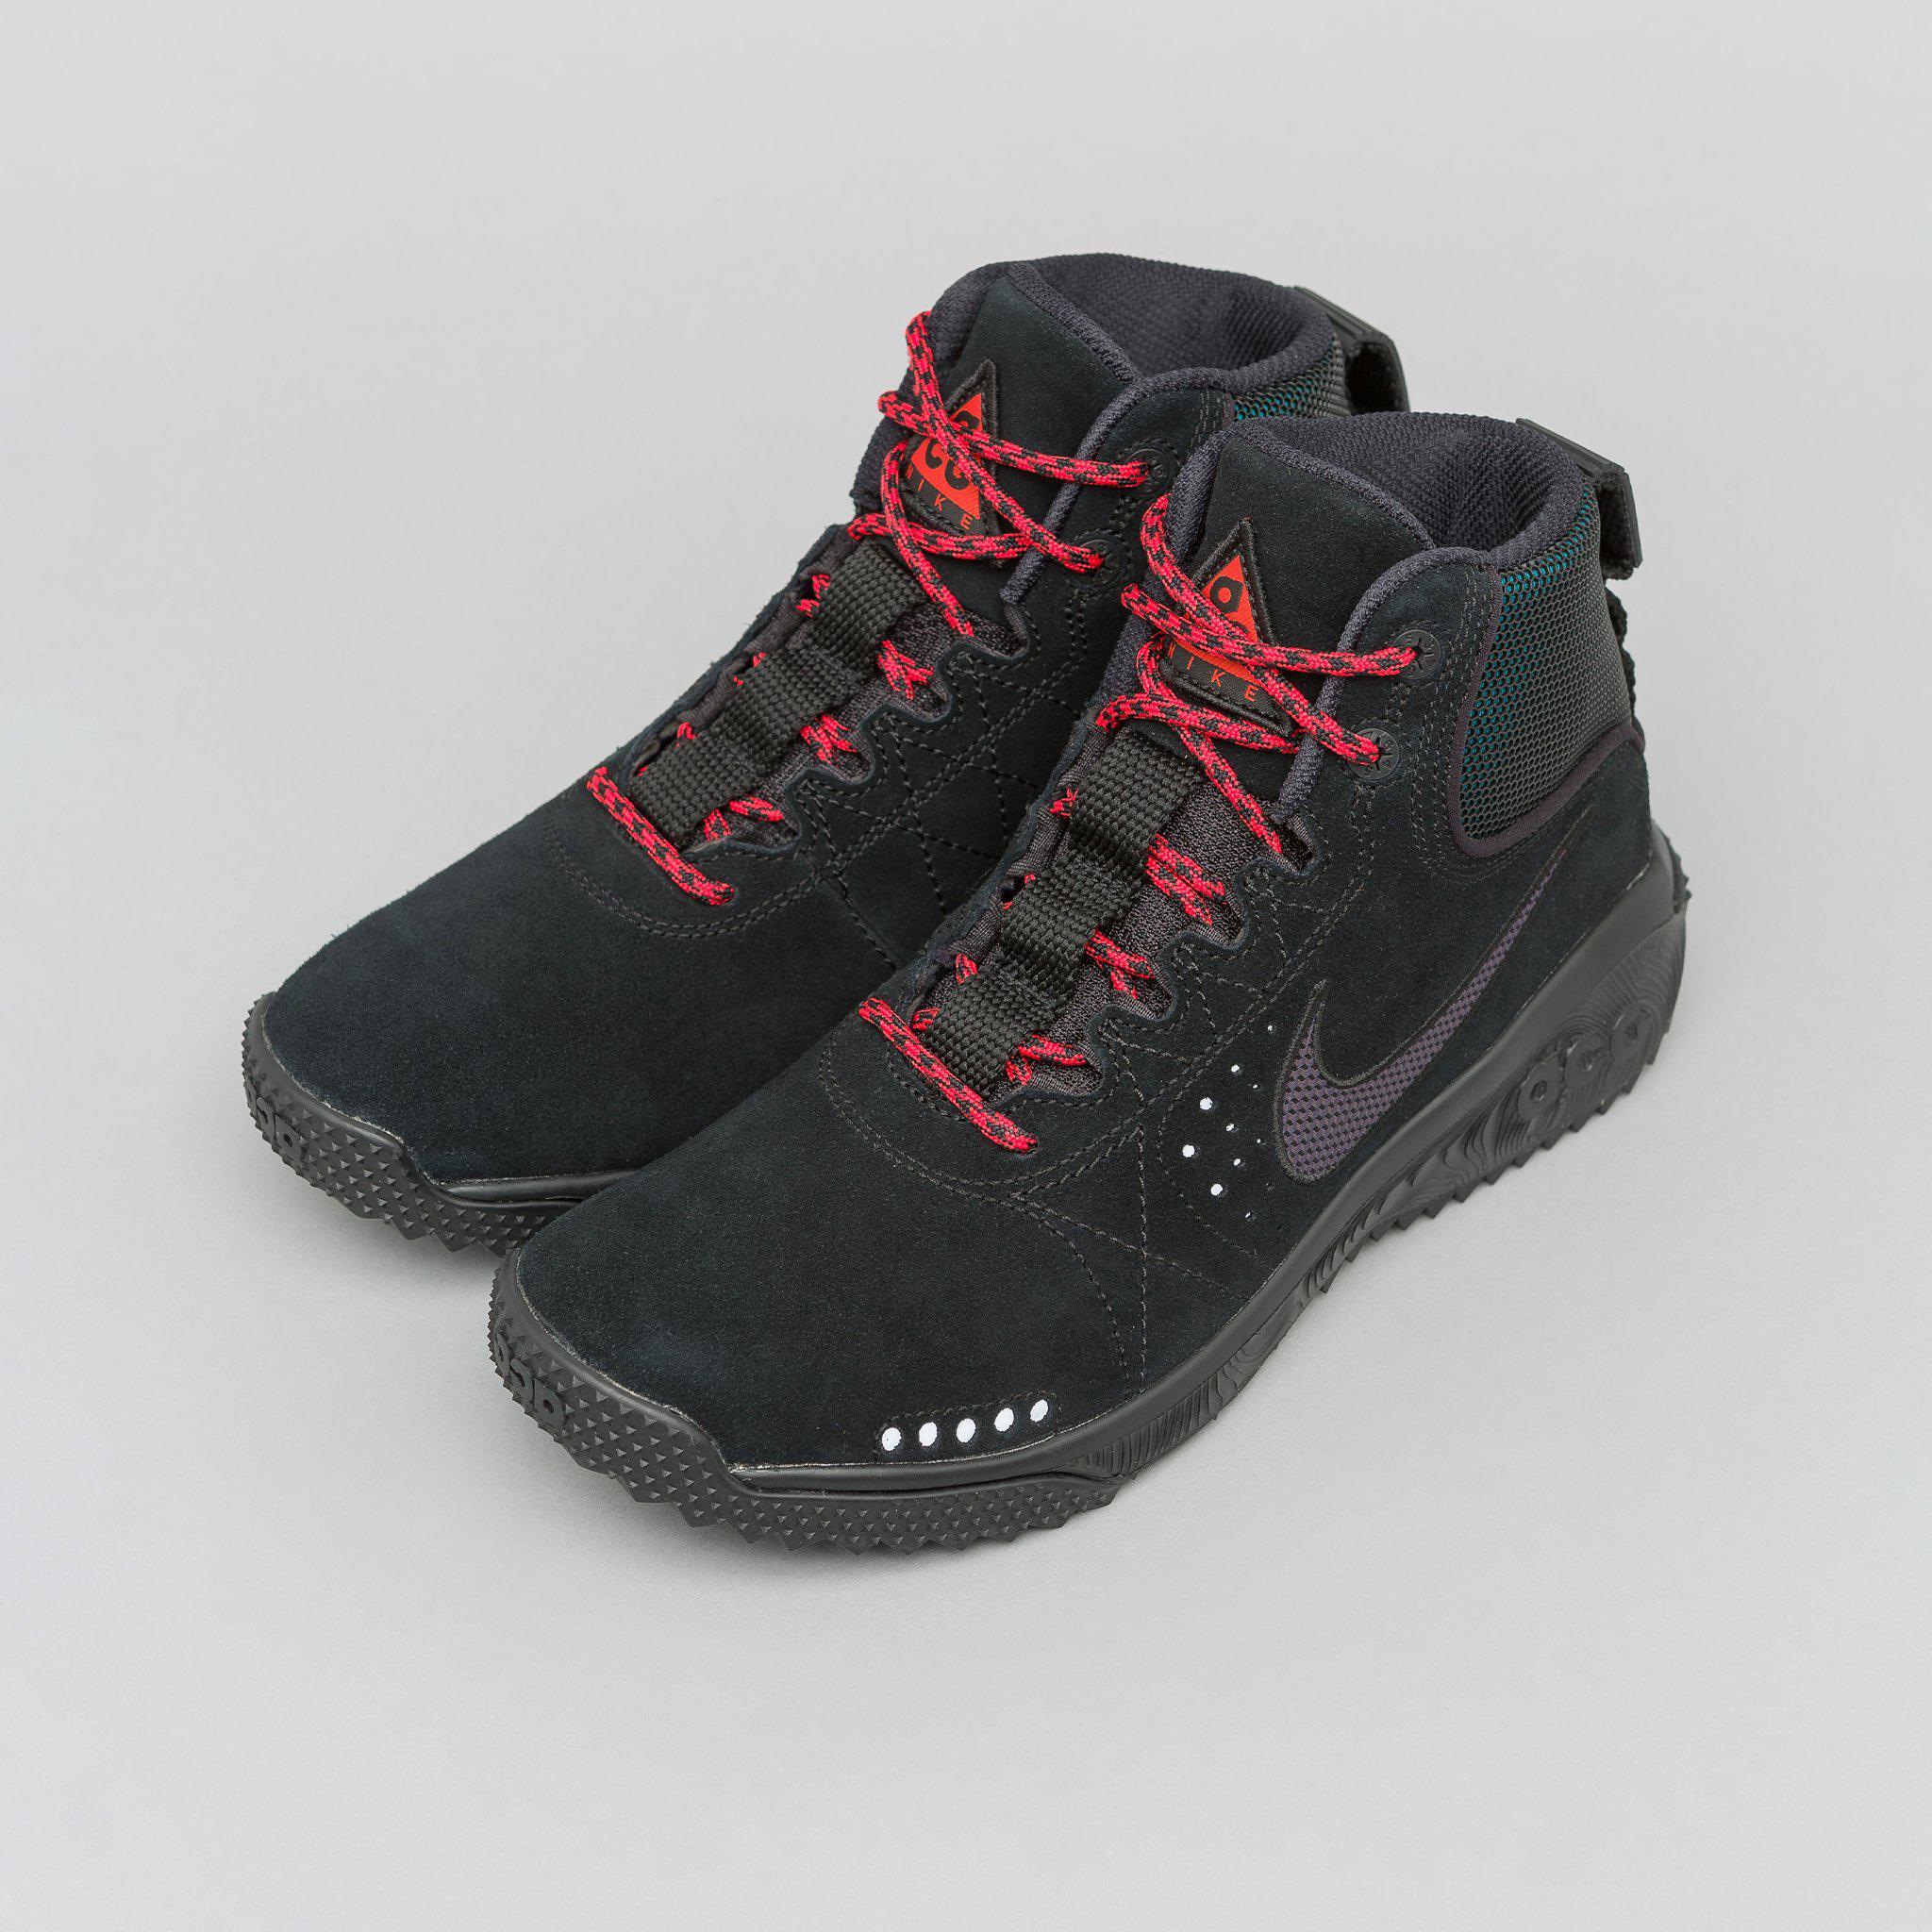 newest b6642 af20b Nike Acg Angel s Rest In Black oil Grey in Black for Men - Lyst